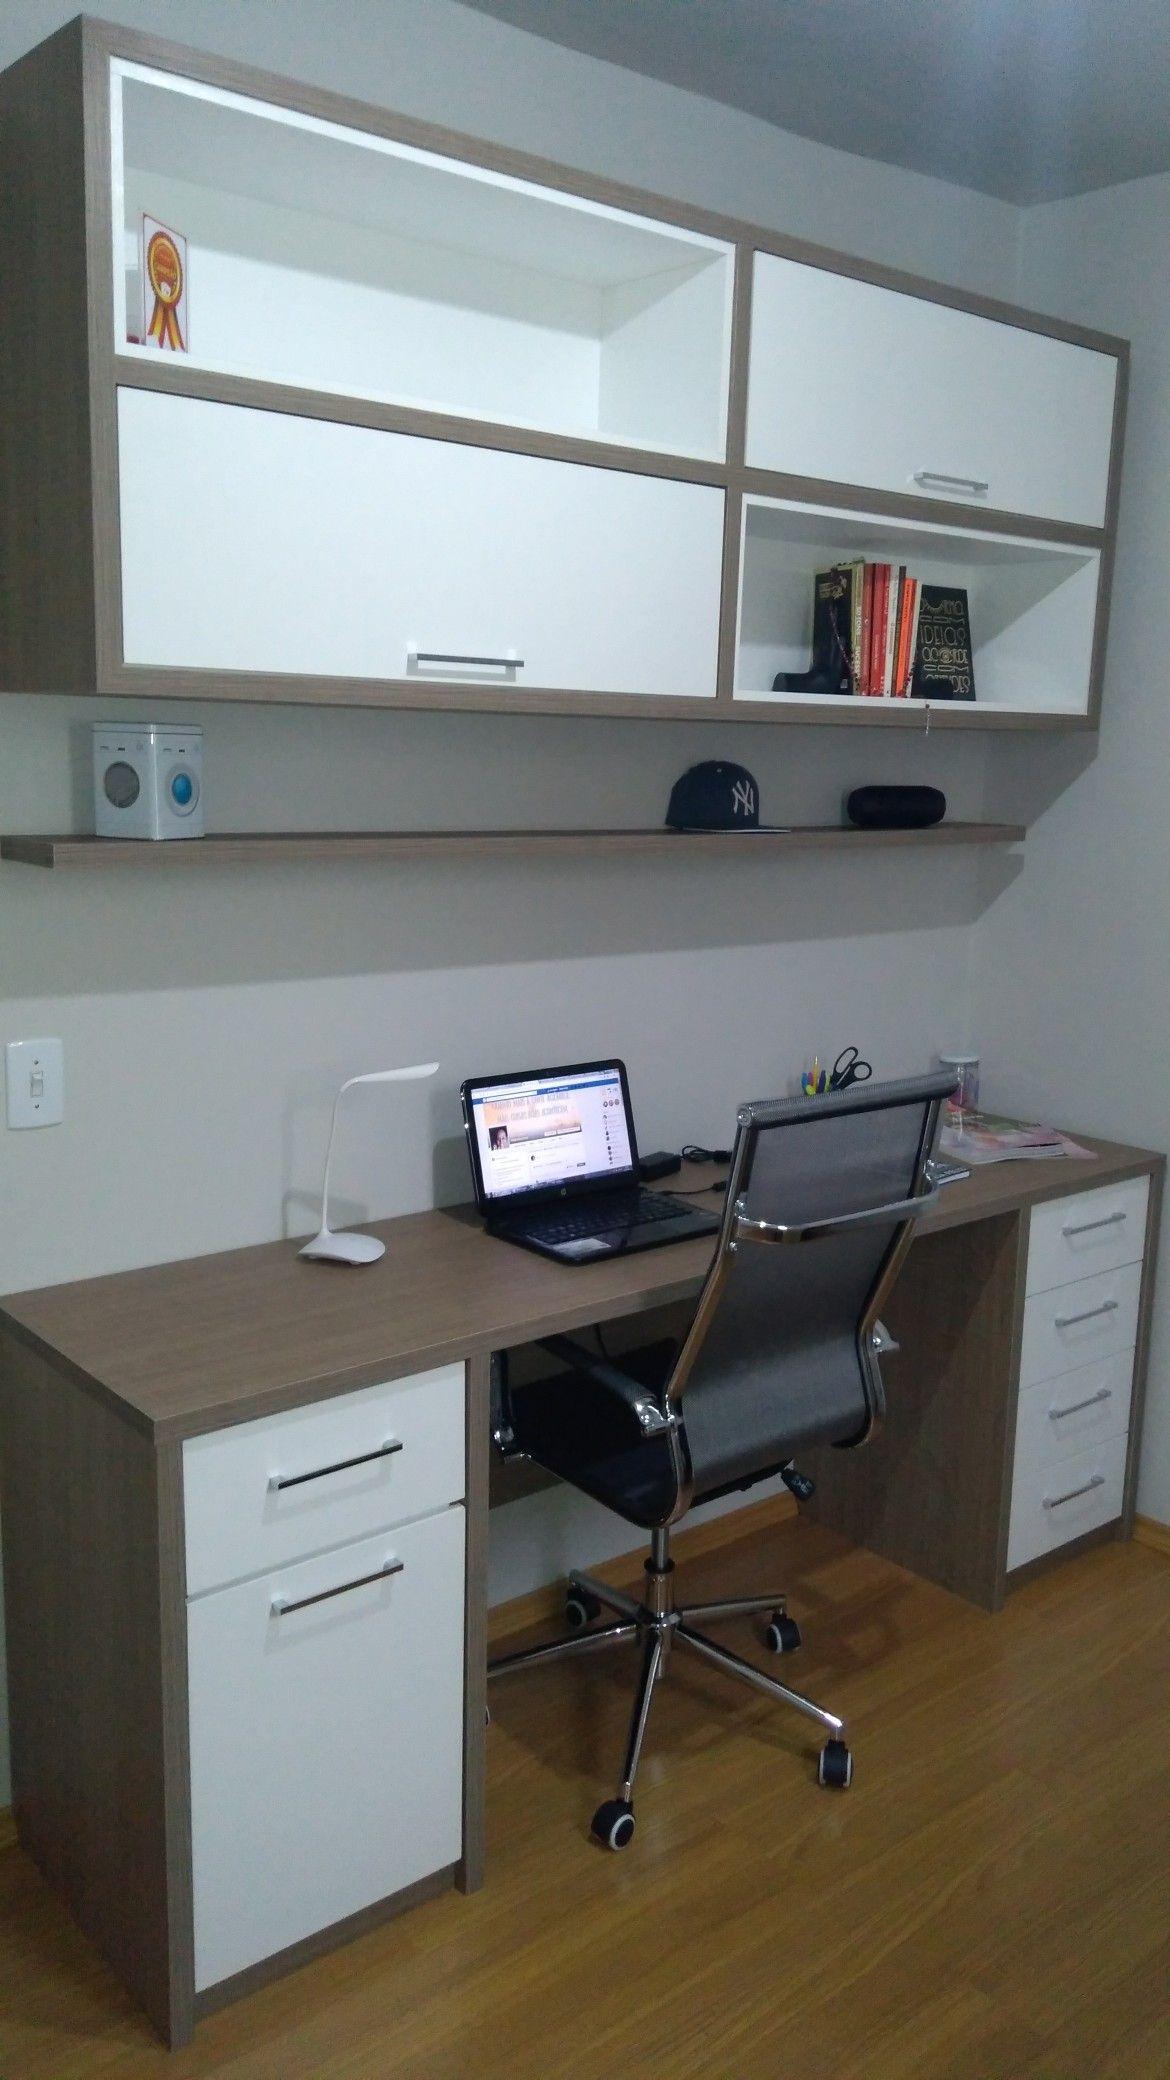 Pin de Markjoseph Bacuetes em plan for own office